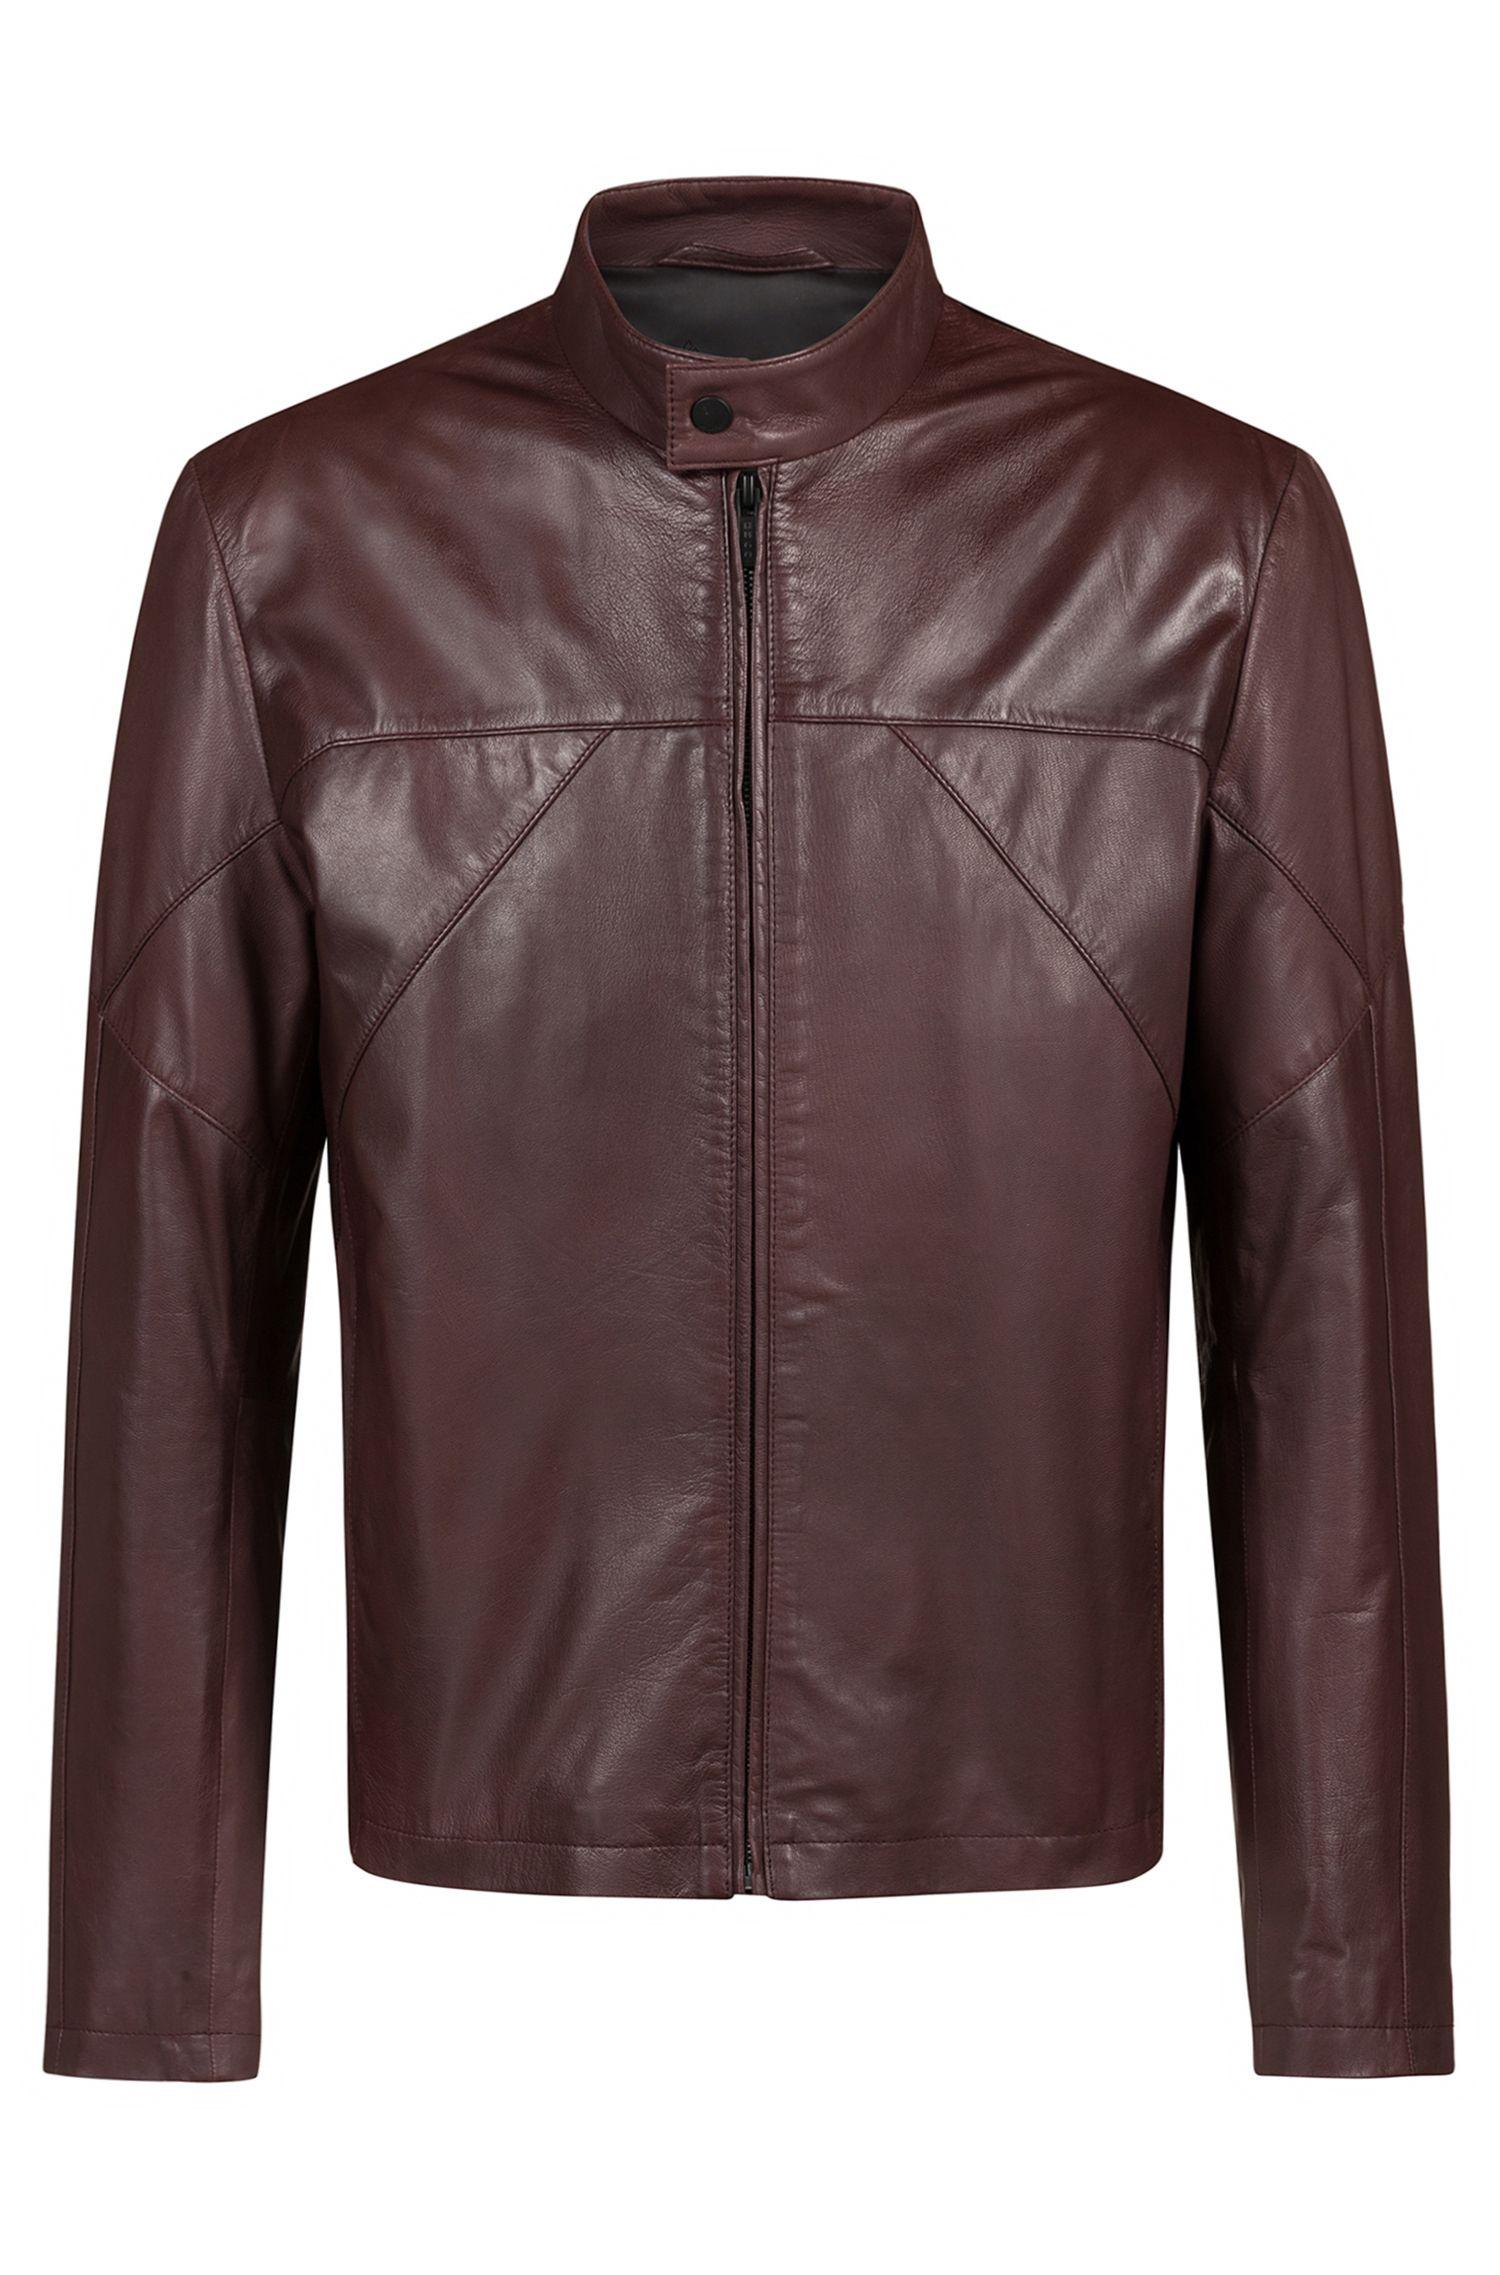 Hugo Boss - Slim-fit biker jacket in nappa leather - 1